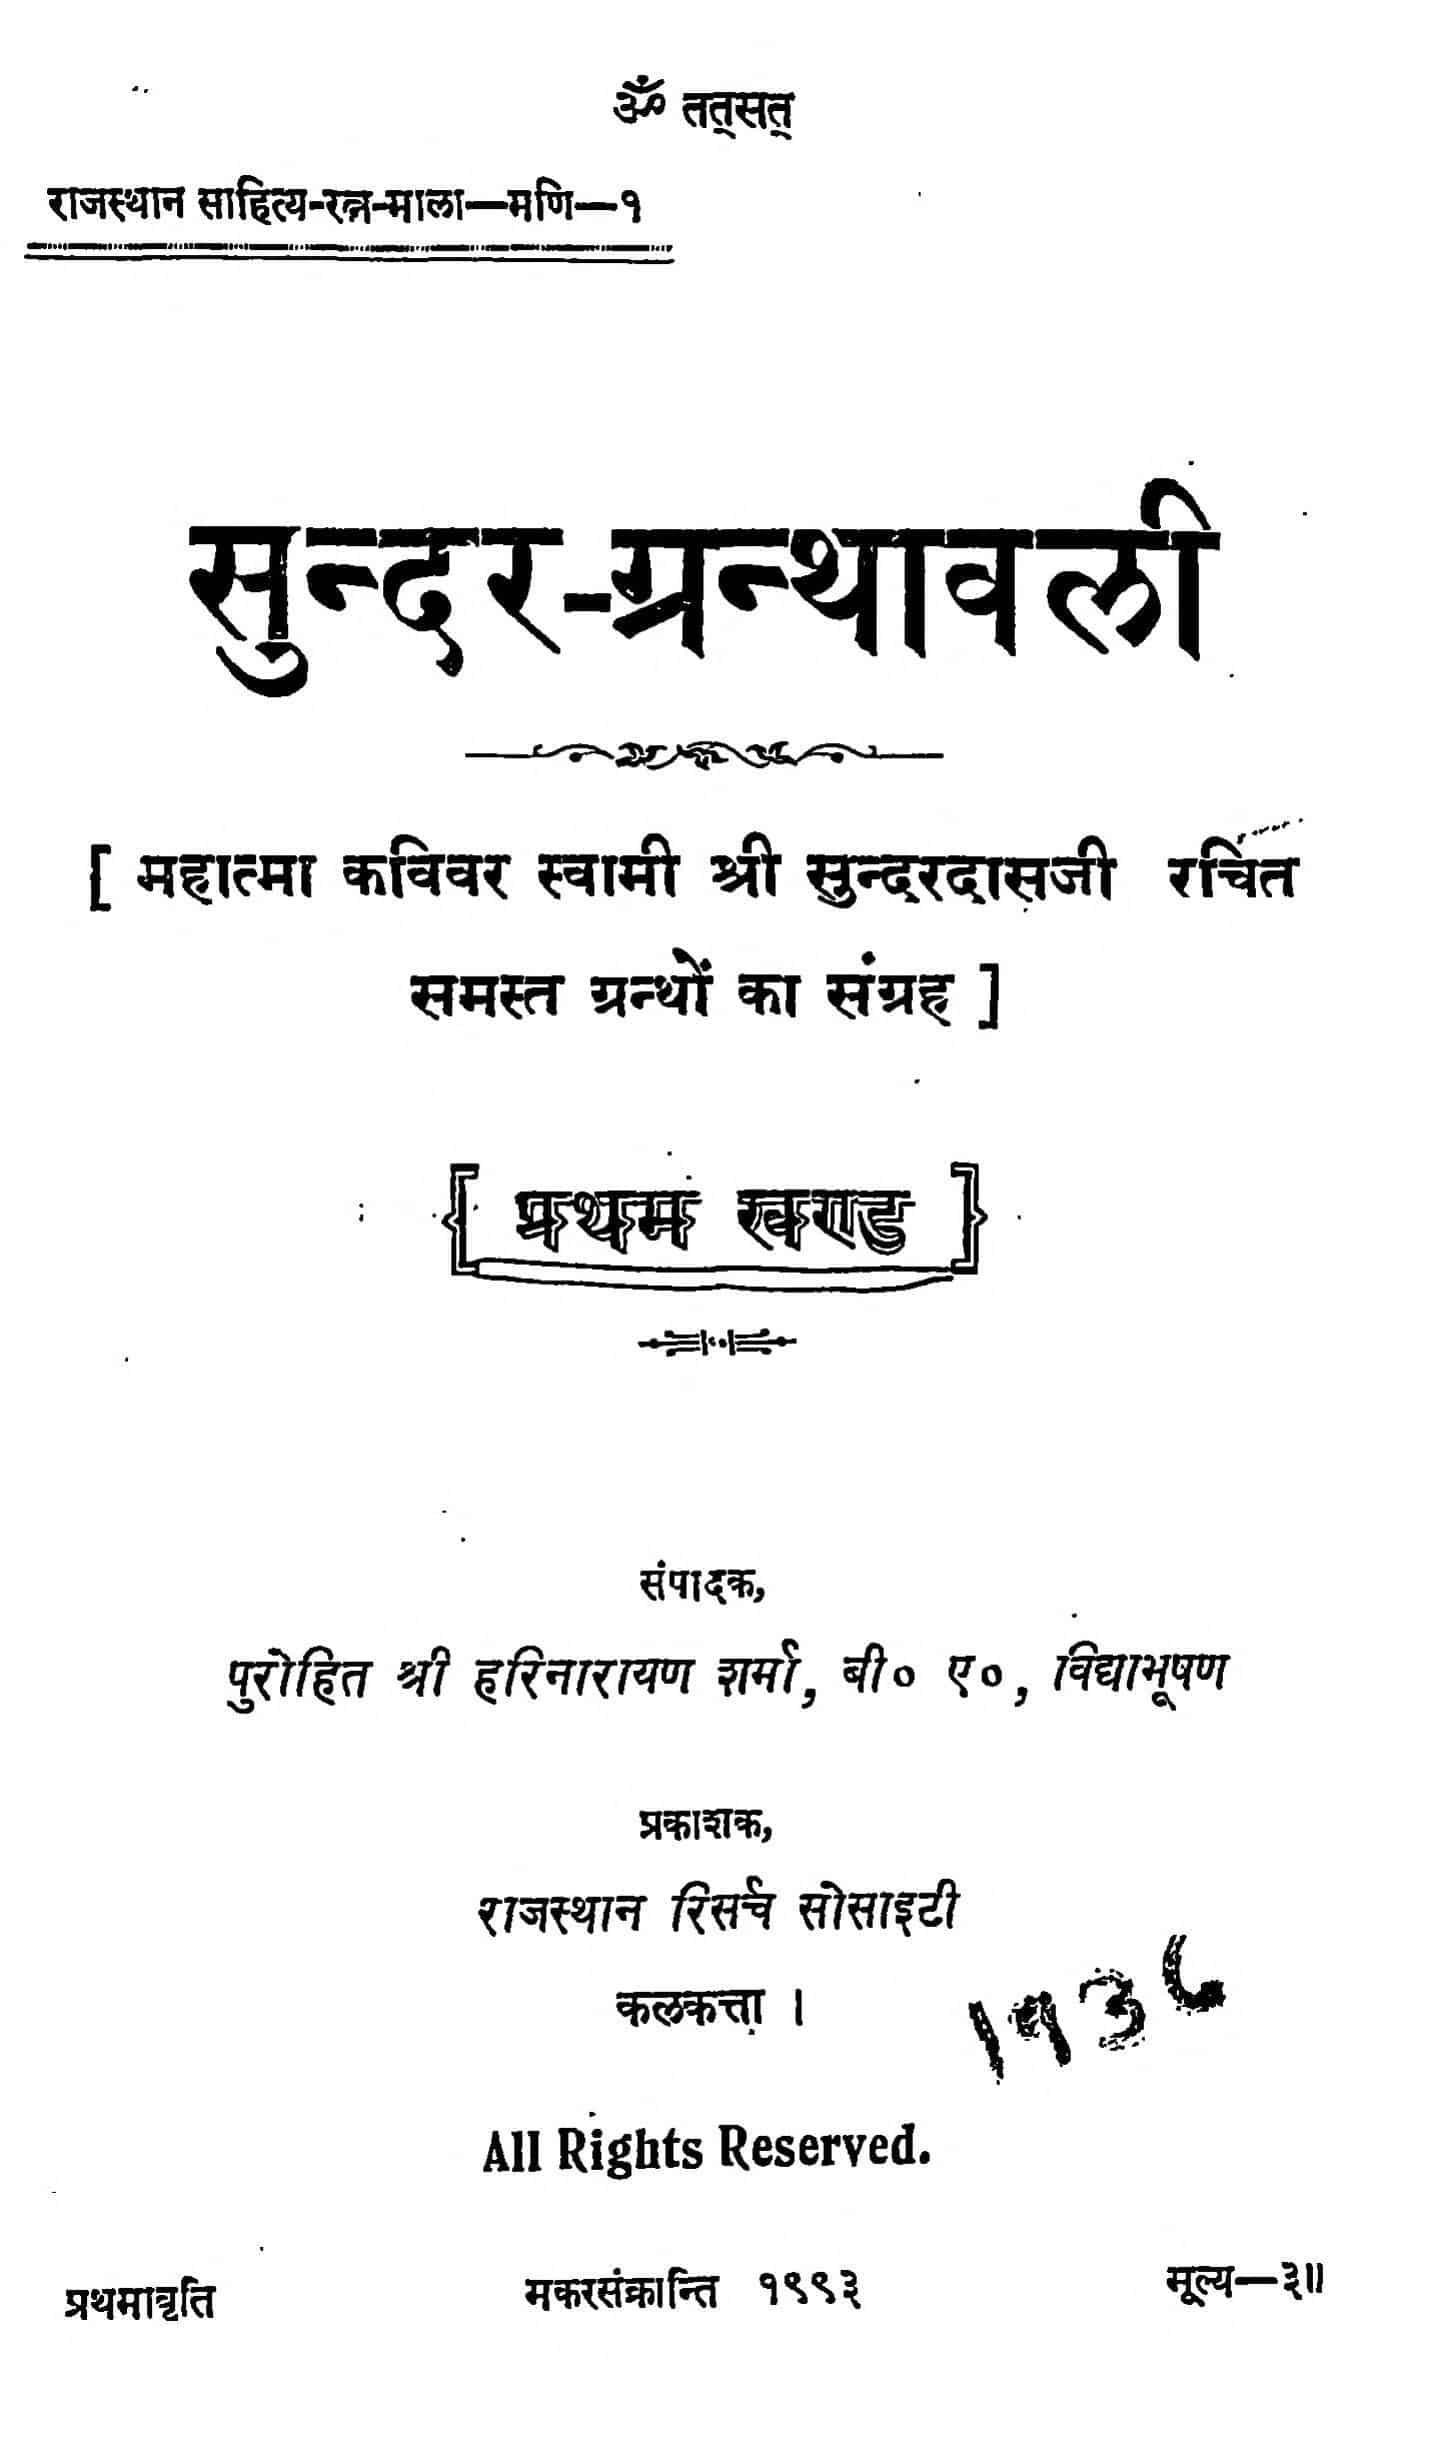 Book Image : सुन्दर ग्रंथावली खण्ड 1 - Sundar Granthawali Khand 1